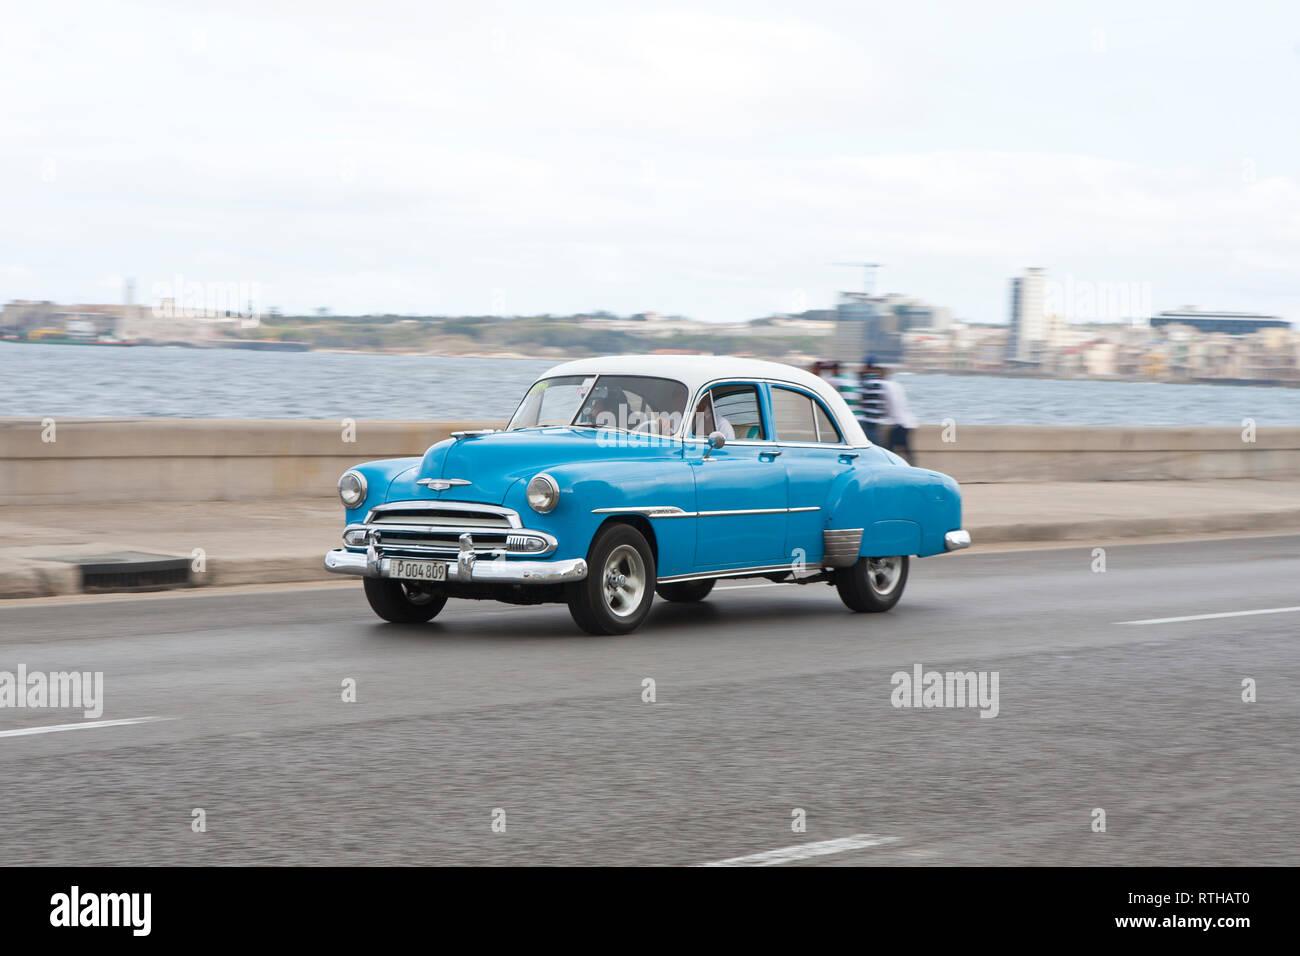 Classic 1950's American car road trip driving along the Malecon in Havana Cuba Stock Photo